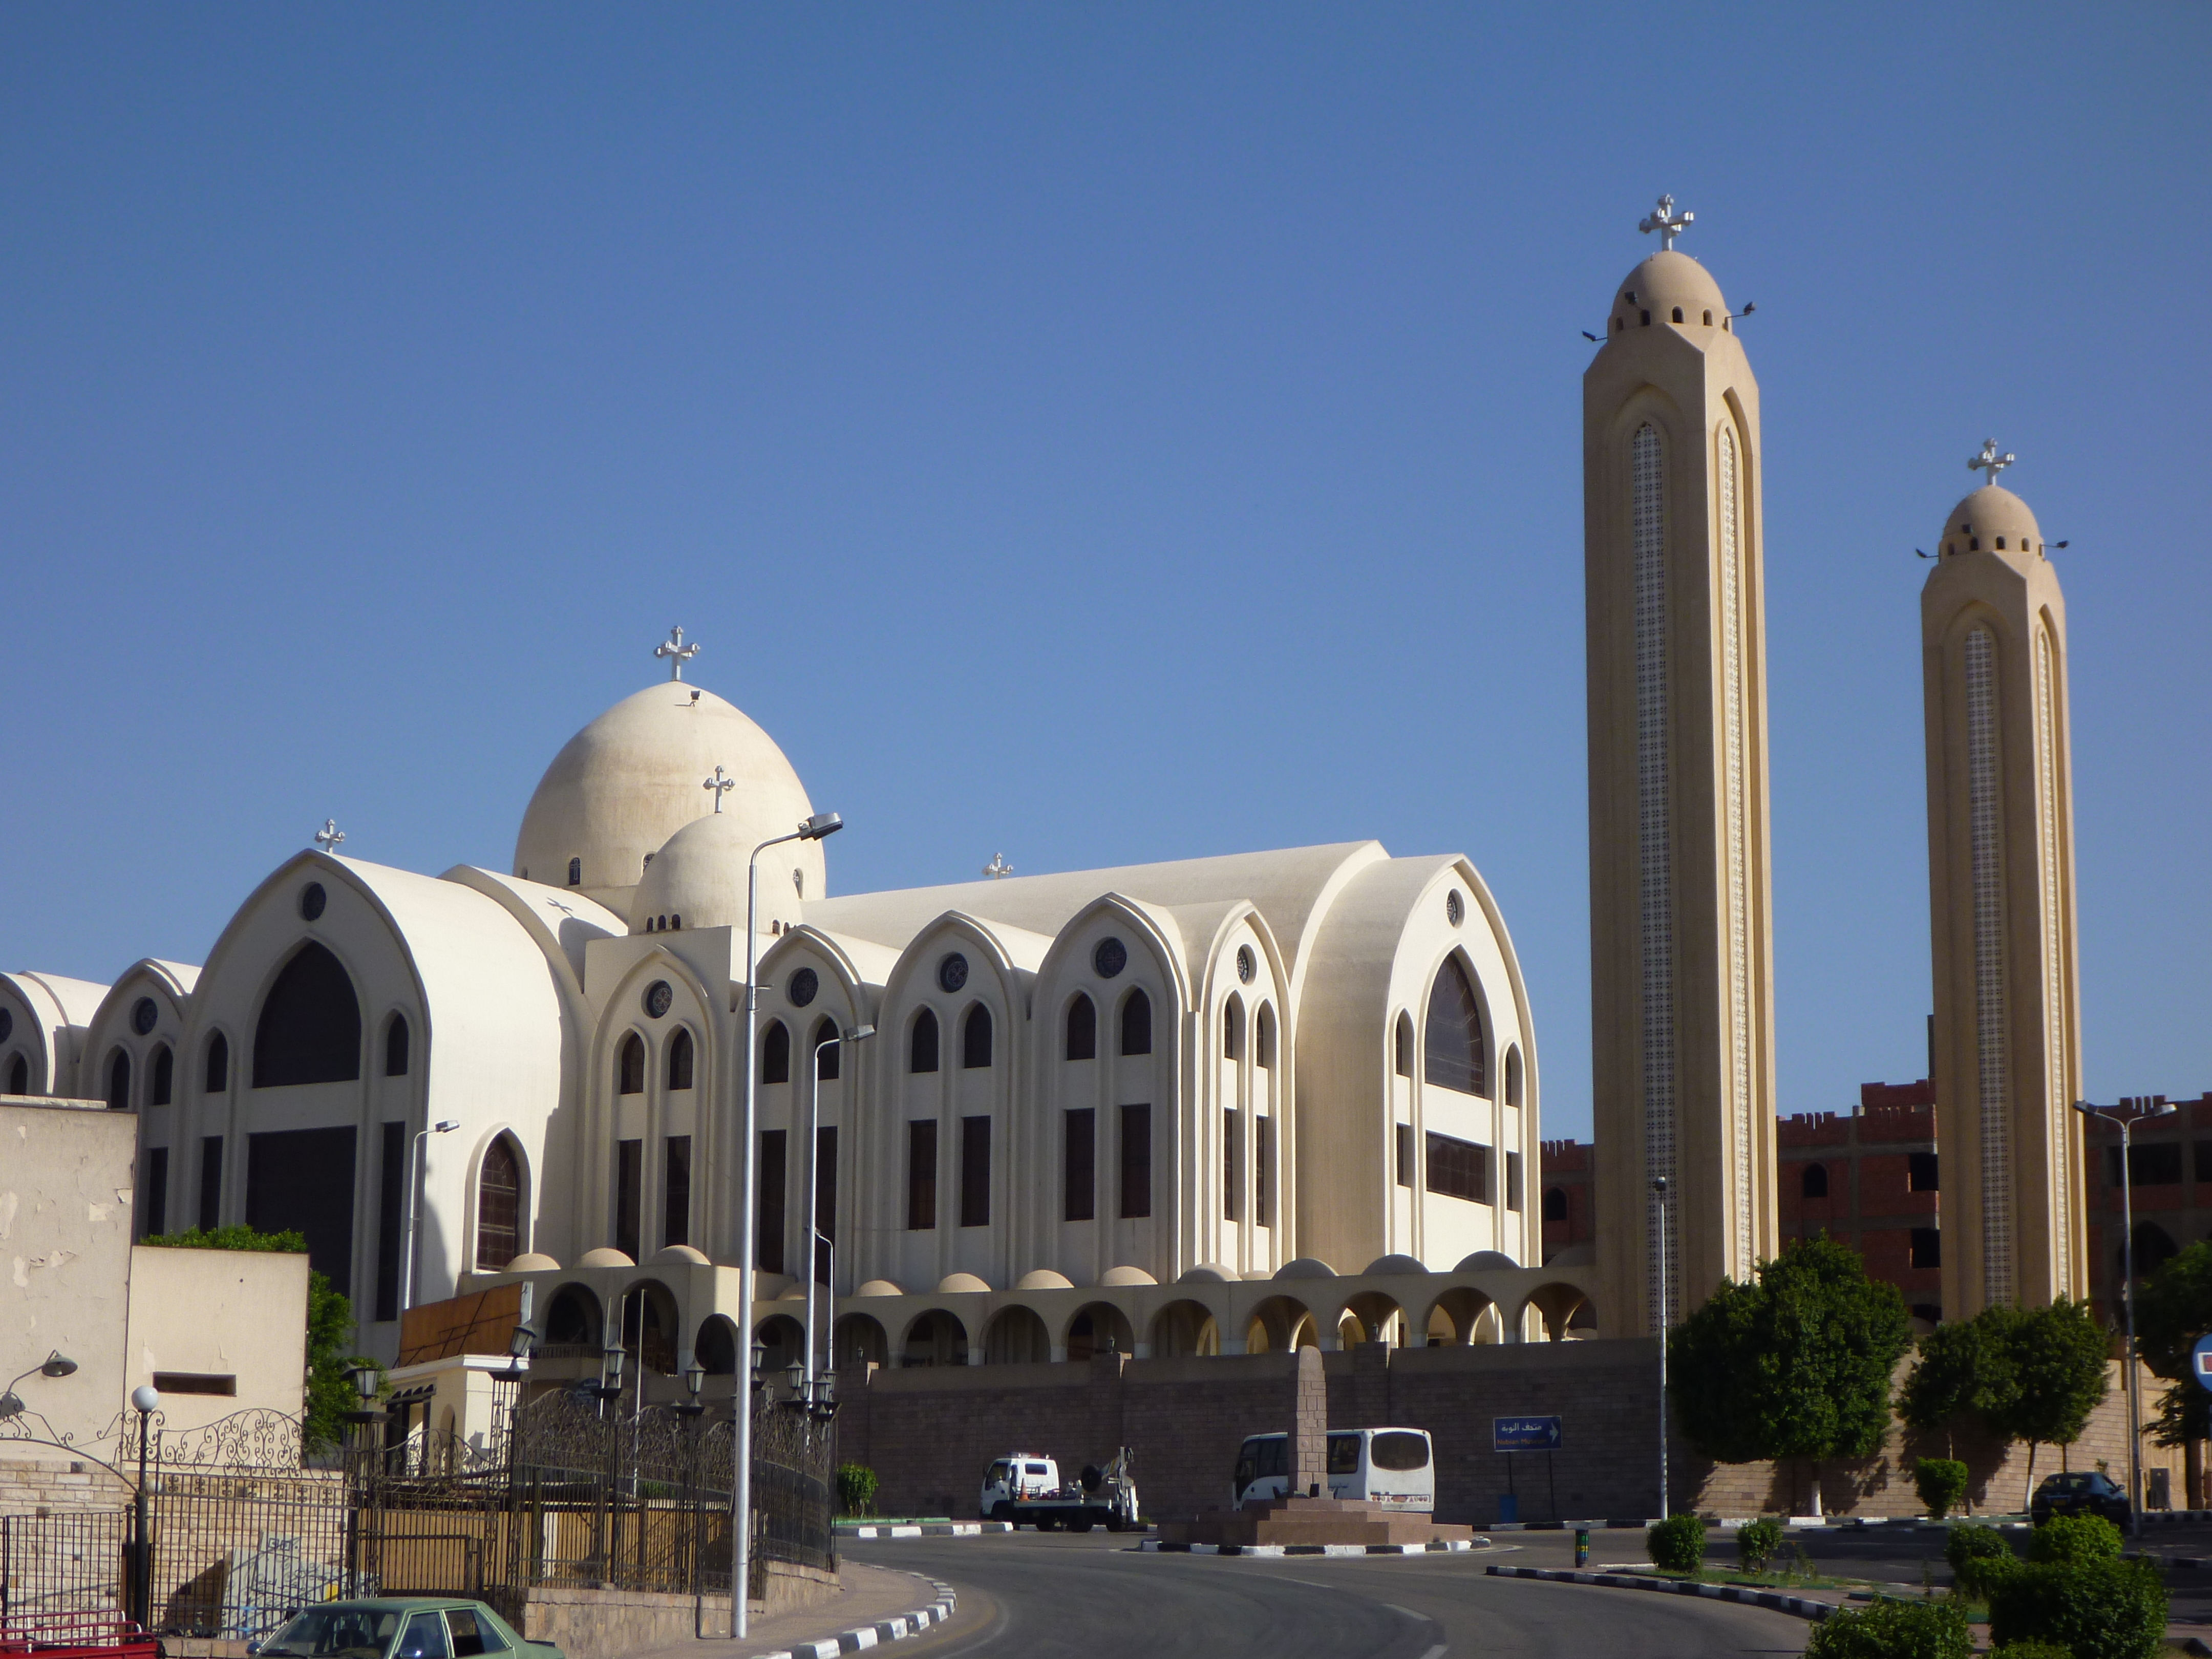 Coptic Orthodox Church in Egypt Coptic Orthodox Church of